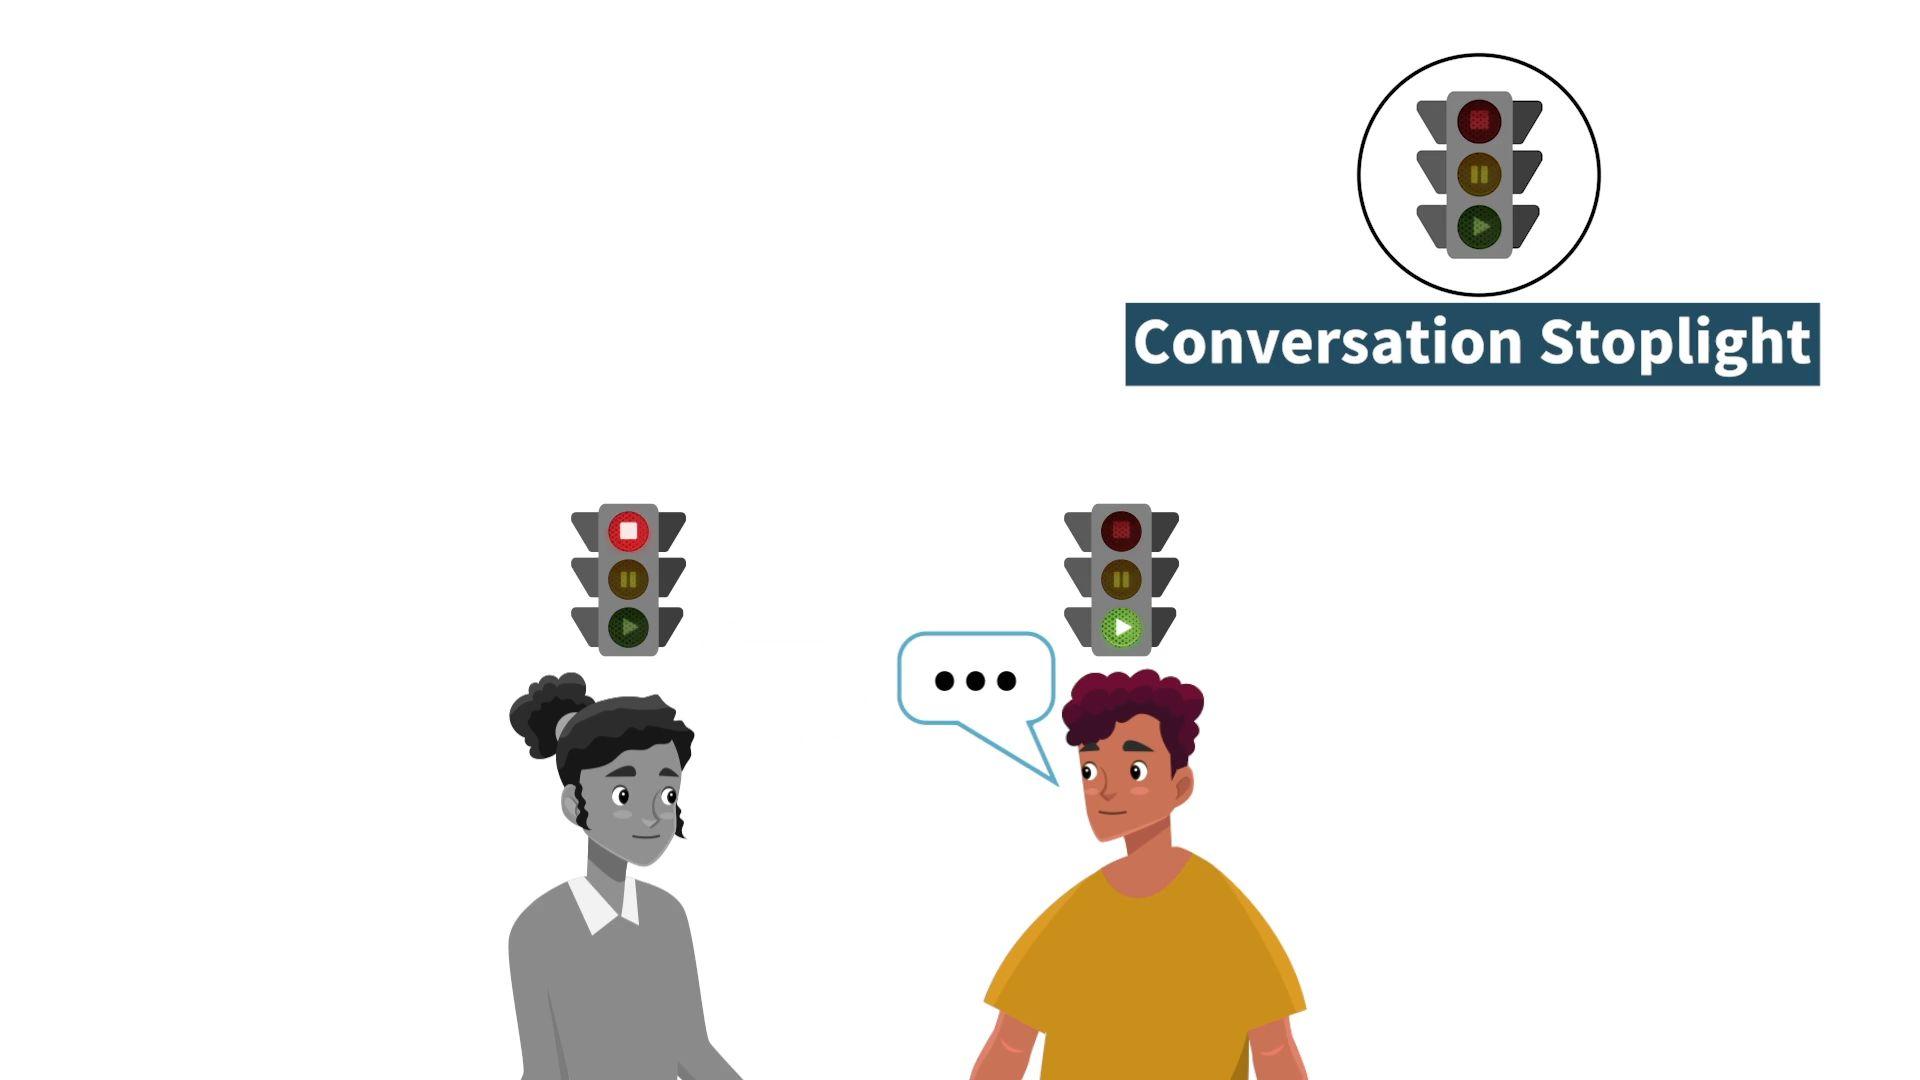 Conversation Stoplight Introduction